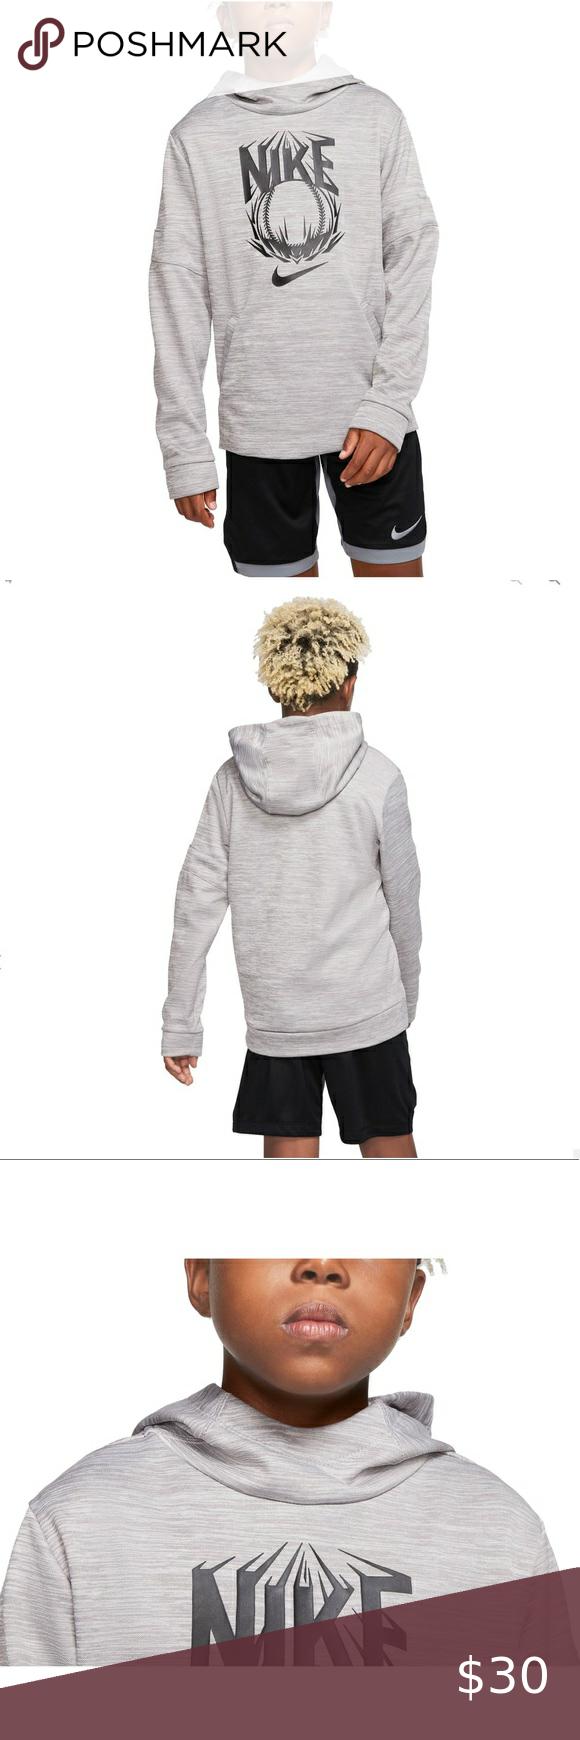 Nike Ysm Baseball Dri Fit Therma Fleece Hoodie Nike Pullover Hoodie Fleece Hoodie Hoodies [ 1740 x 580 Pixel ]